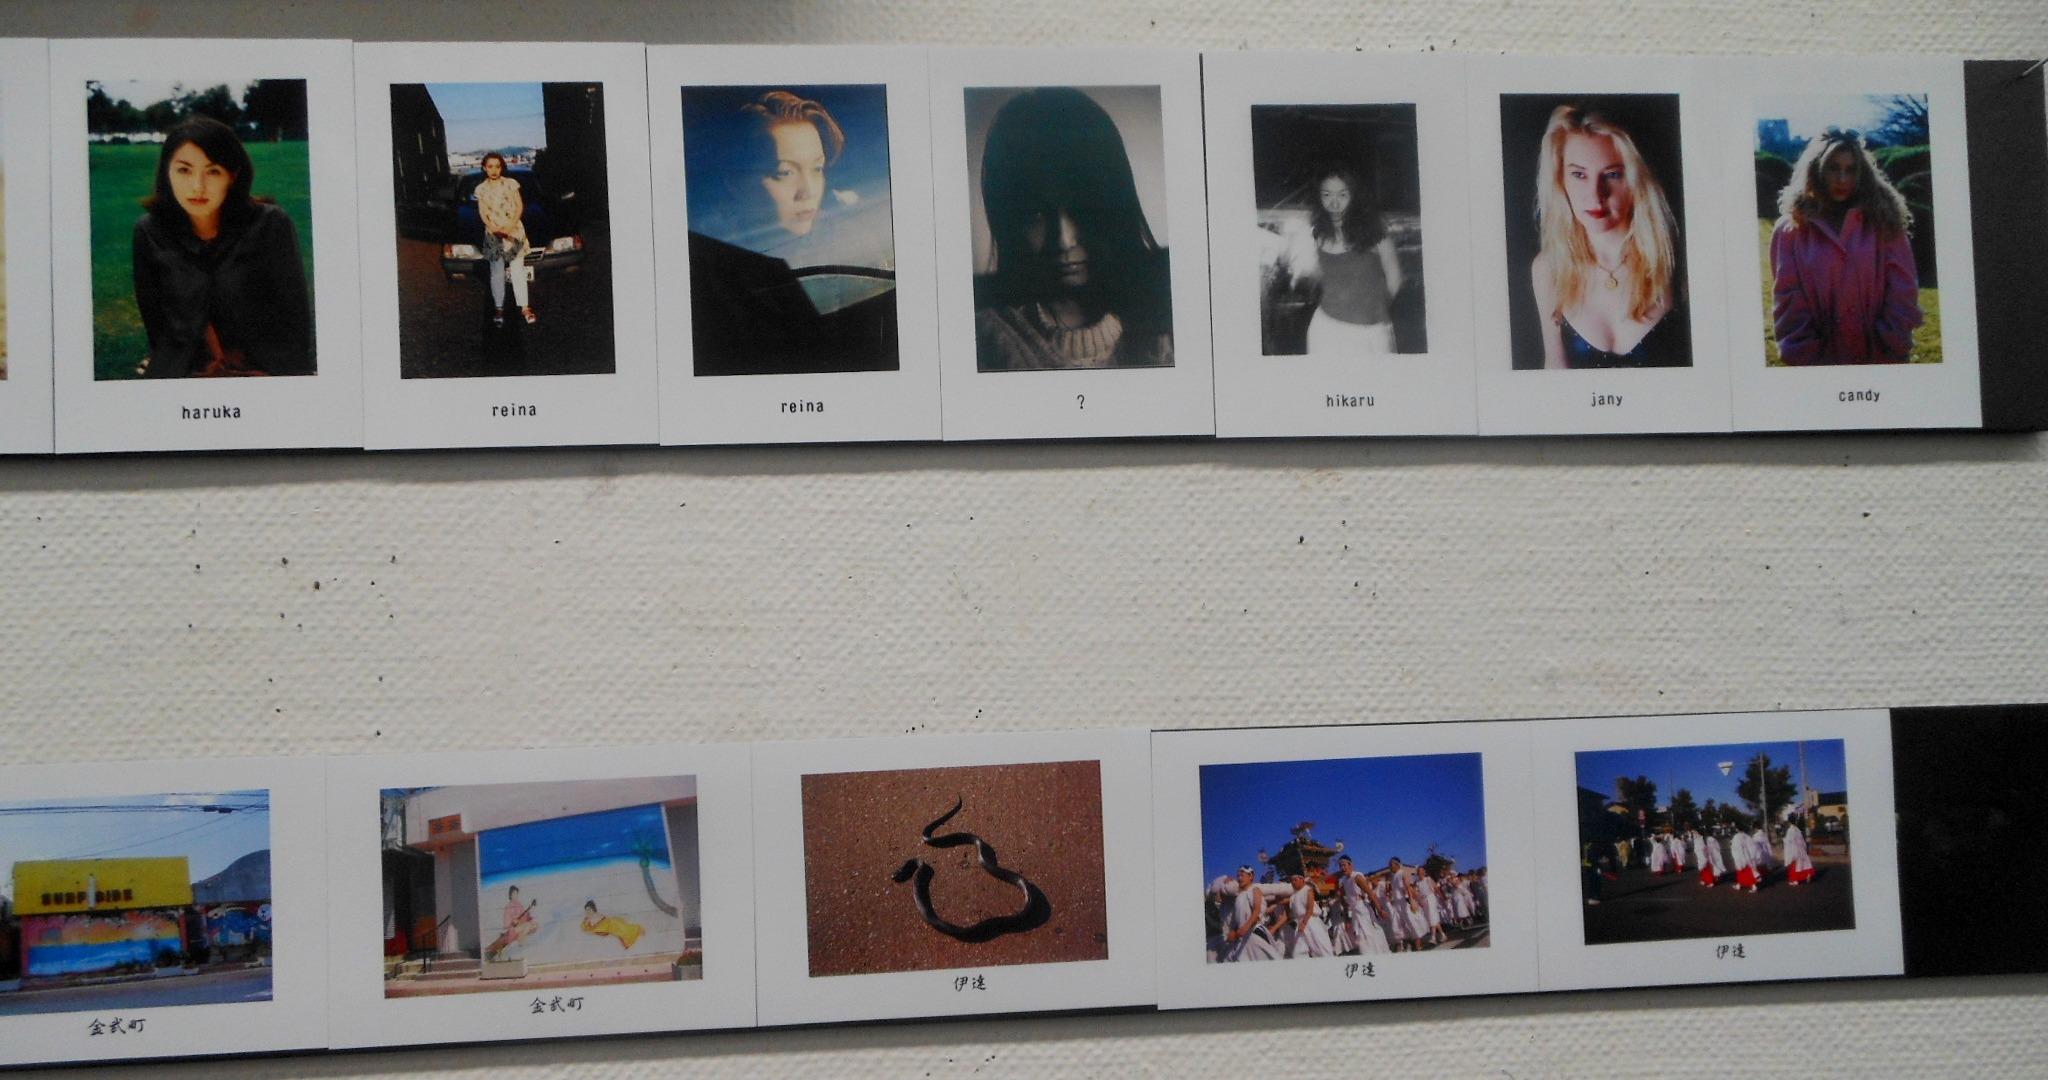 1885)②「写真クラブ「BePHaT!!」 第9回作品展 『夢 Photo 2012』」市民g. 終了11月21日(水)~11月25日(日)_f0126829_23293360.jpg